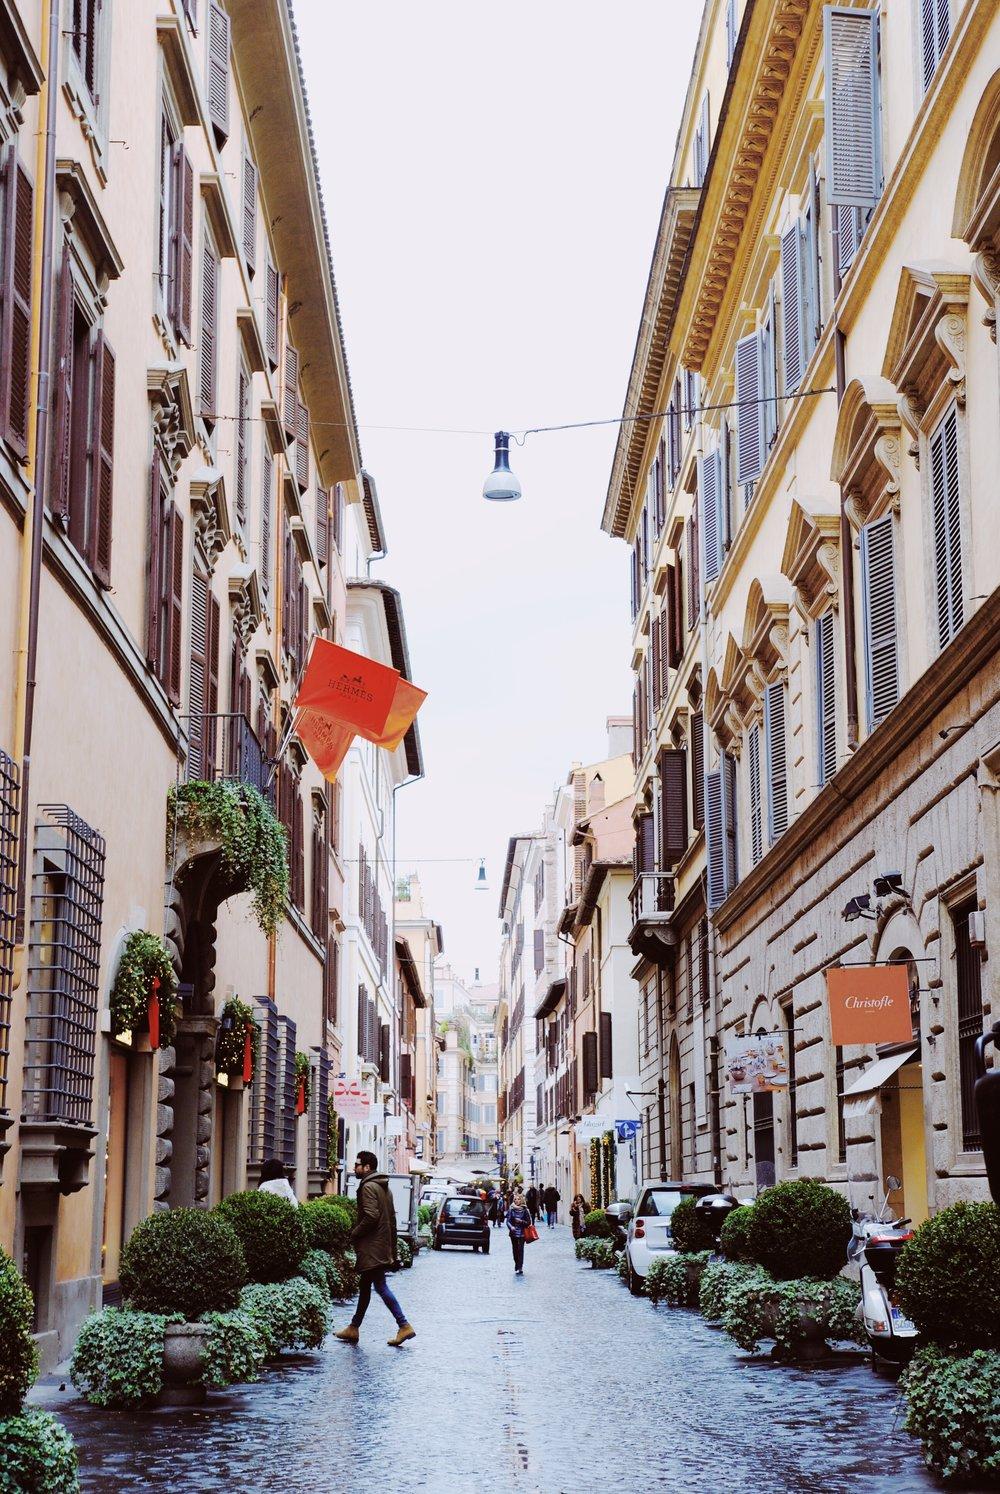 Spanish Steps: Posh neighborhood to stay in